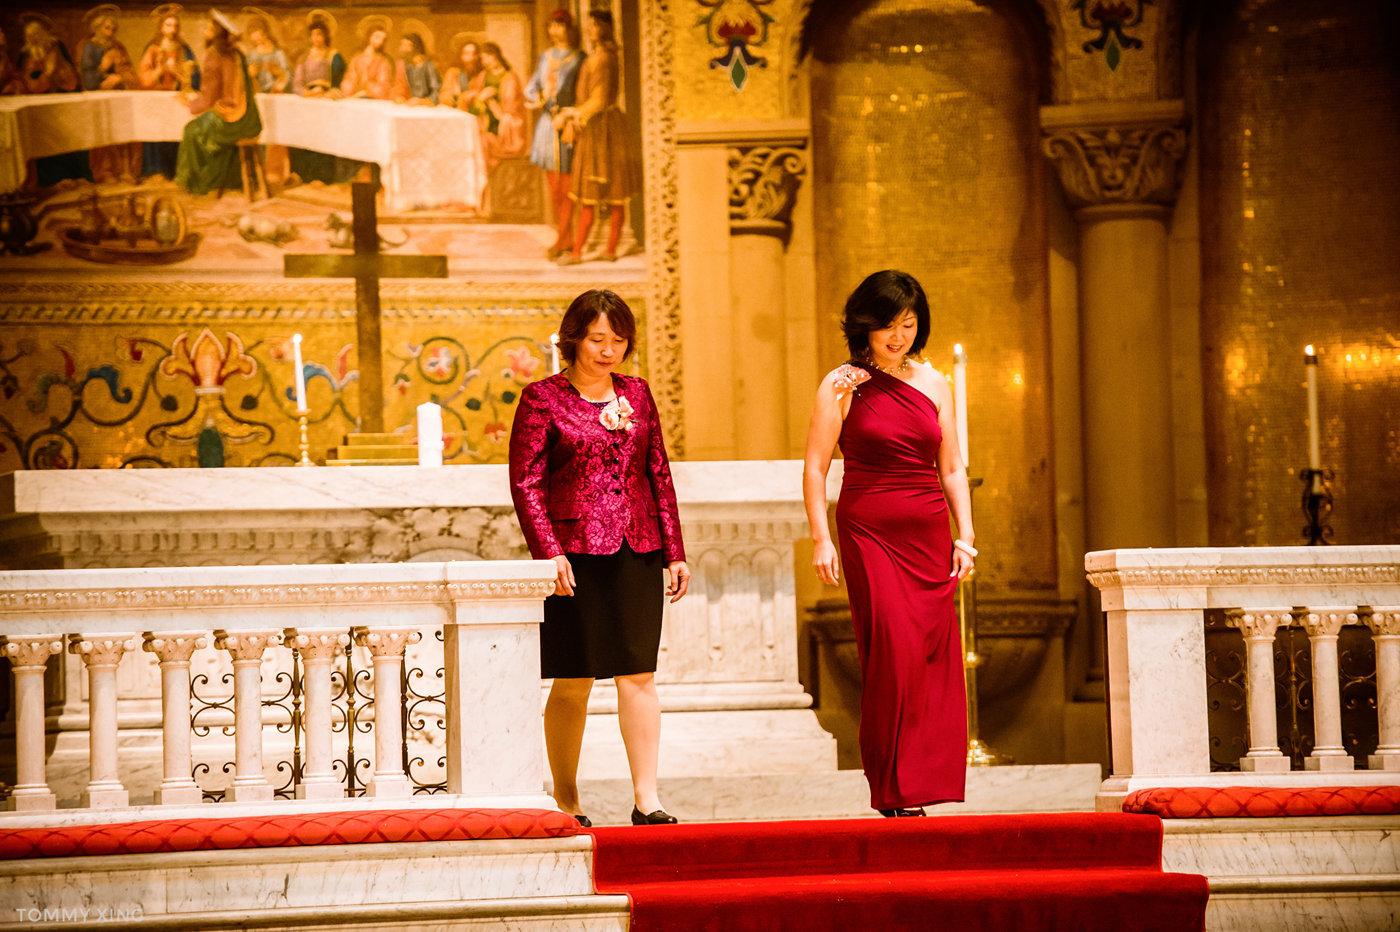 STANFORD MEMORIAL CHURCH WEDDING - Wenjie & Chengcheng - SAN FRANCISCO BAY AREA 斯坦福教堂婚礼跟拍 - 洛杉矶婚礼婚纱照摄影师 Tommy Xing Photography058.jpg